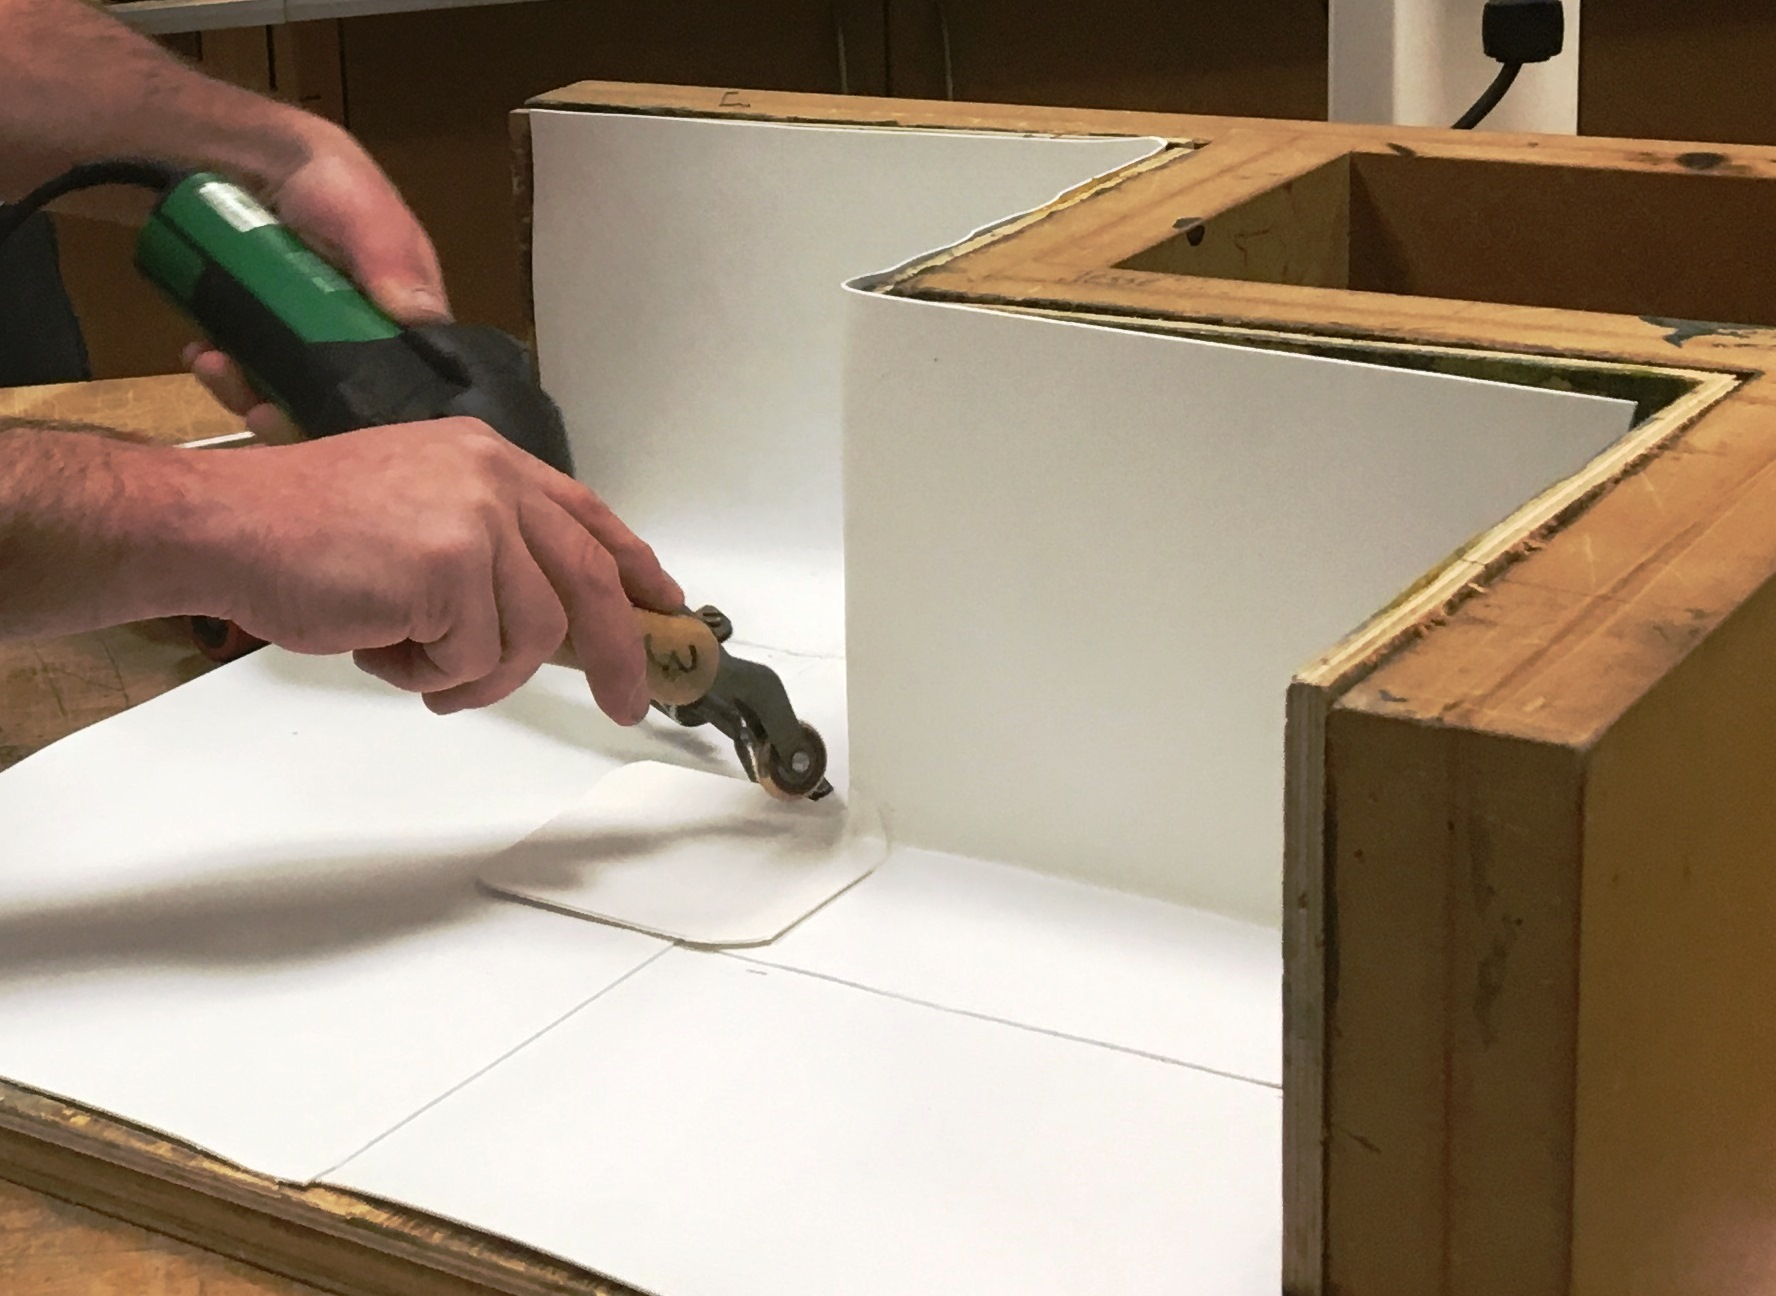 Training welding